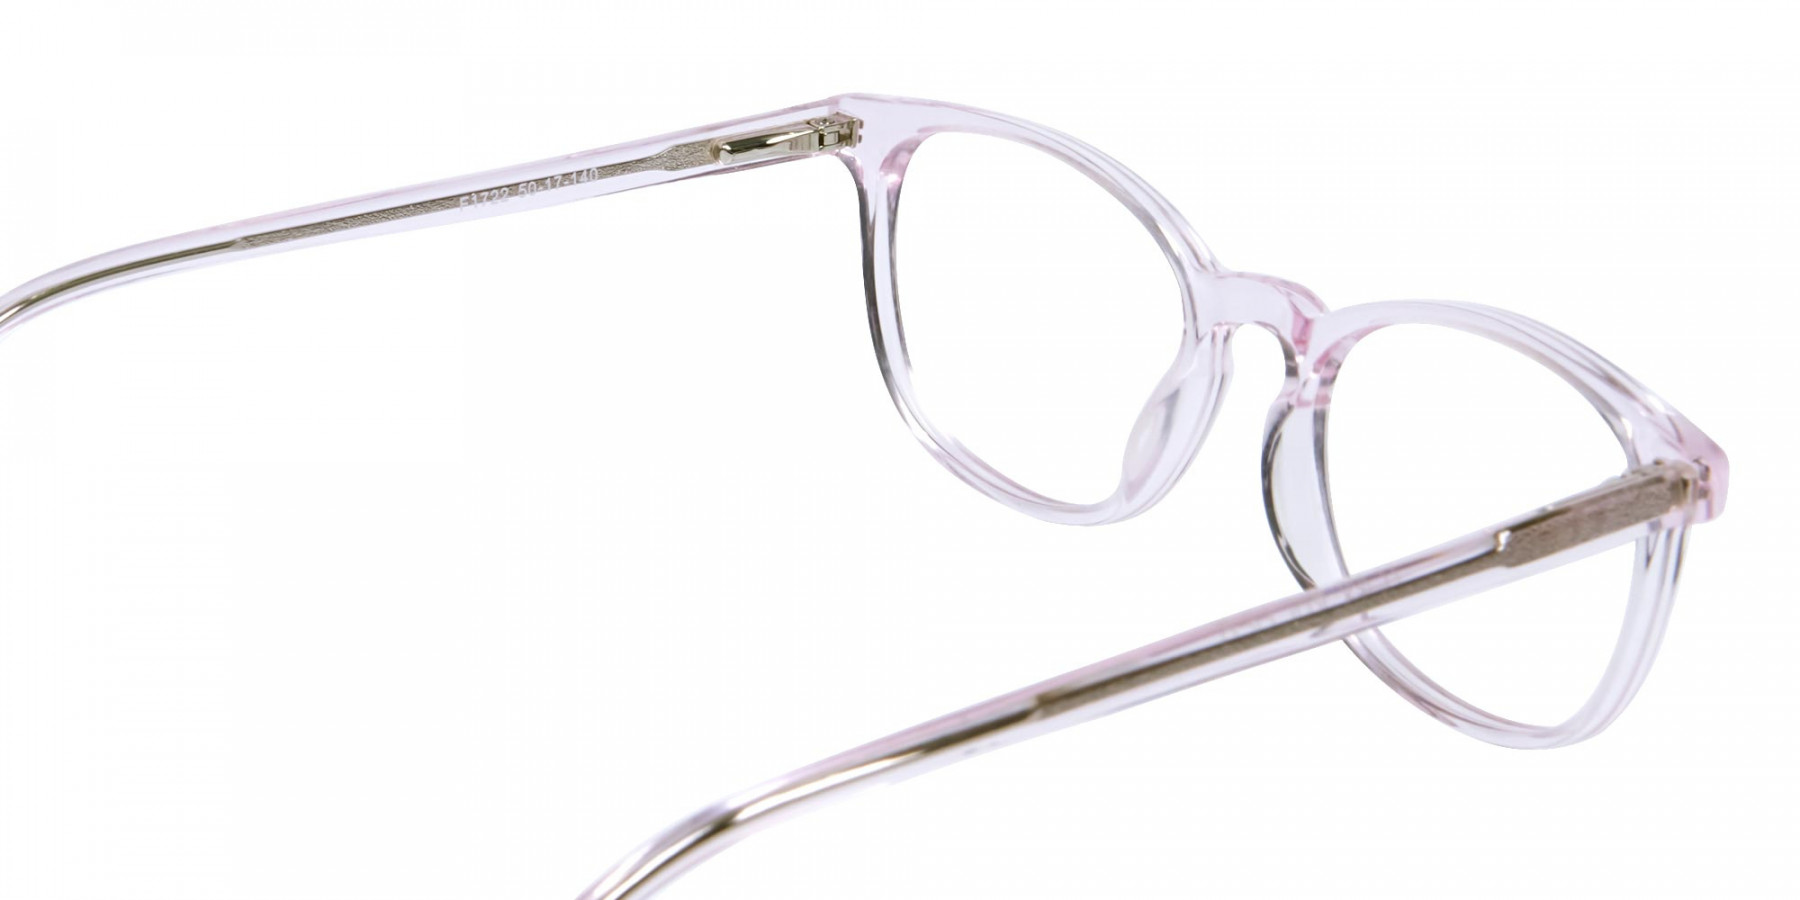 Frame in Cherry Blush Pink - 1